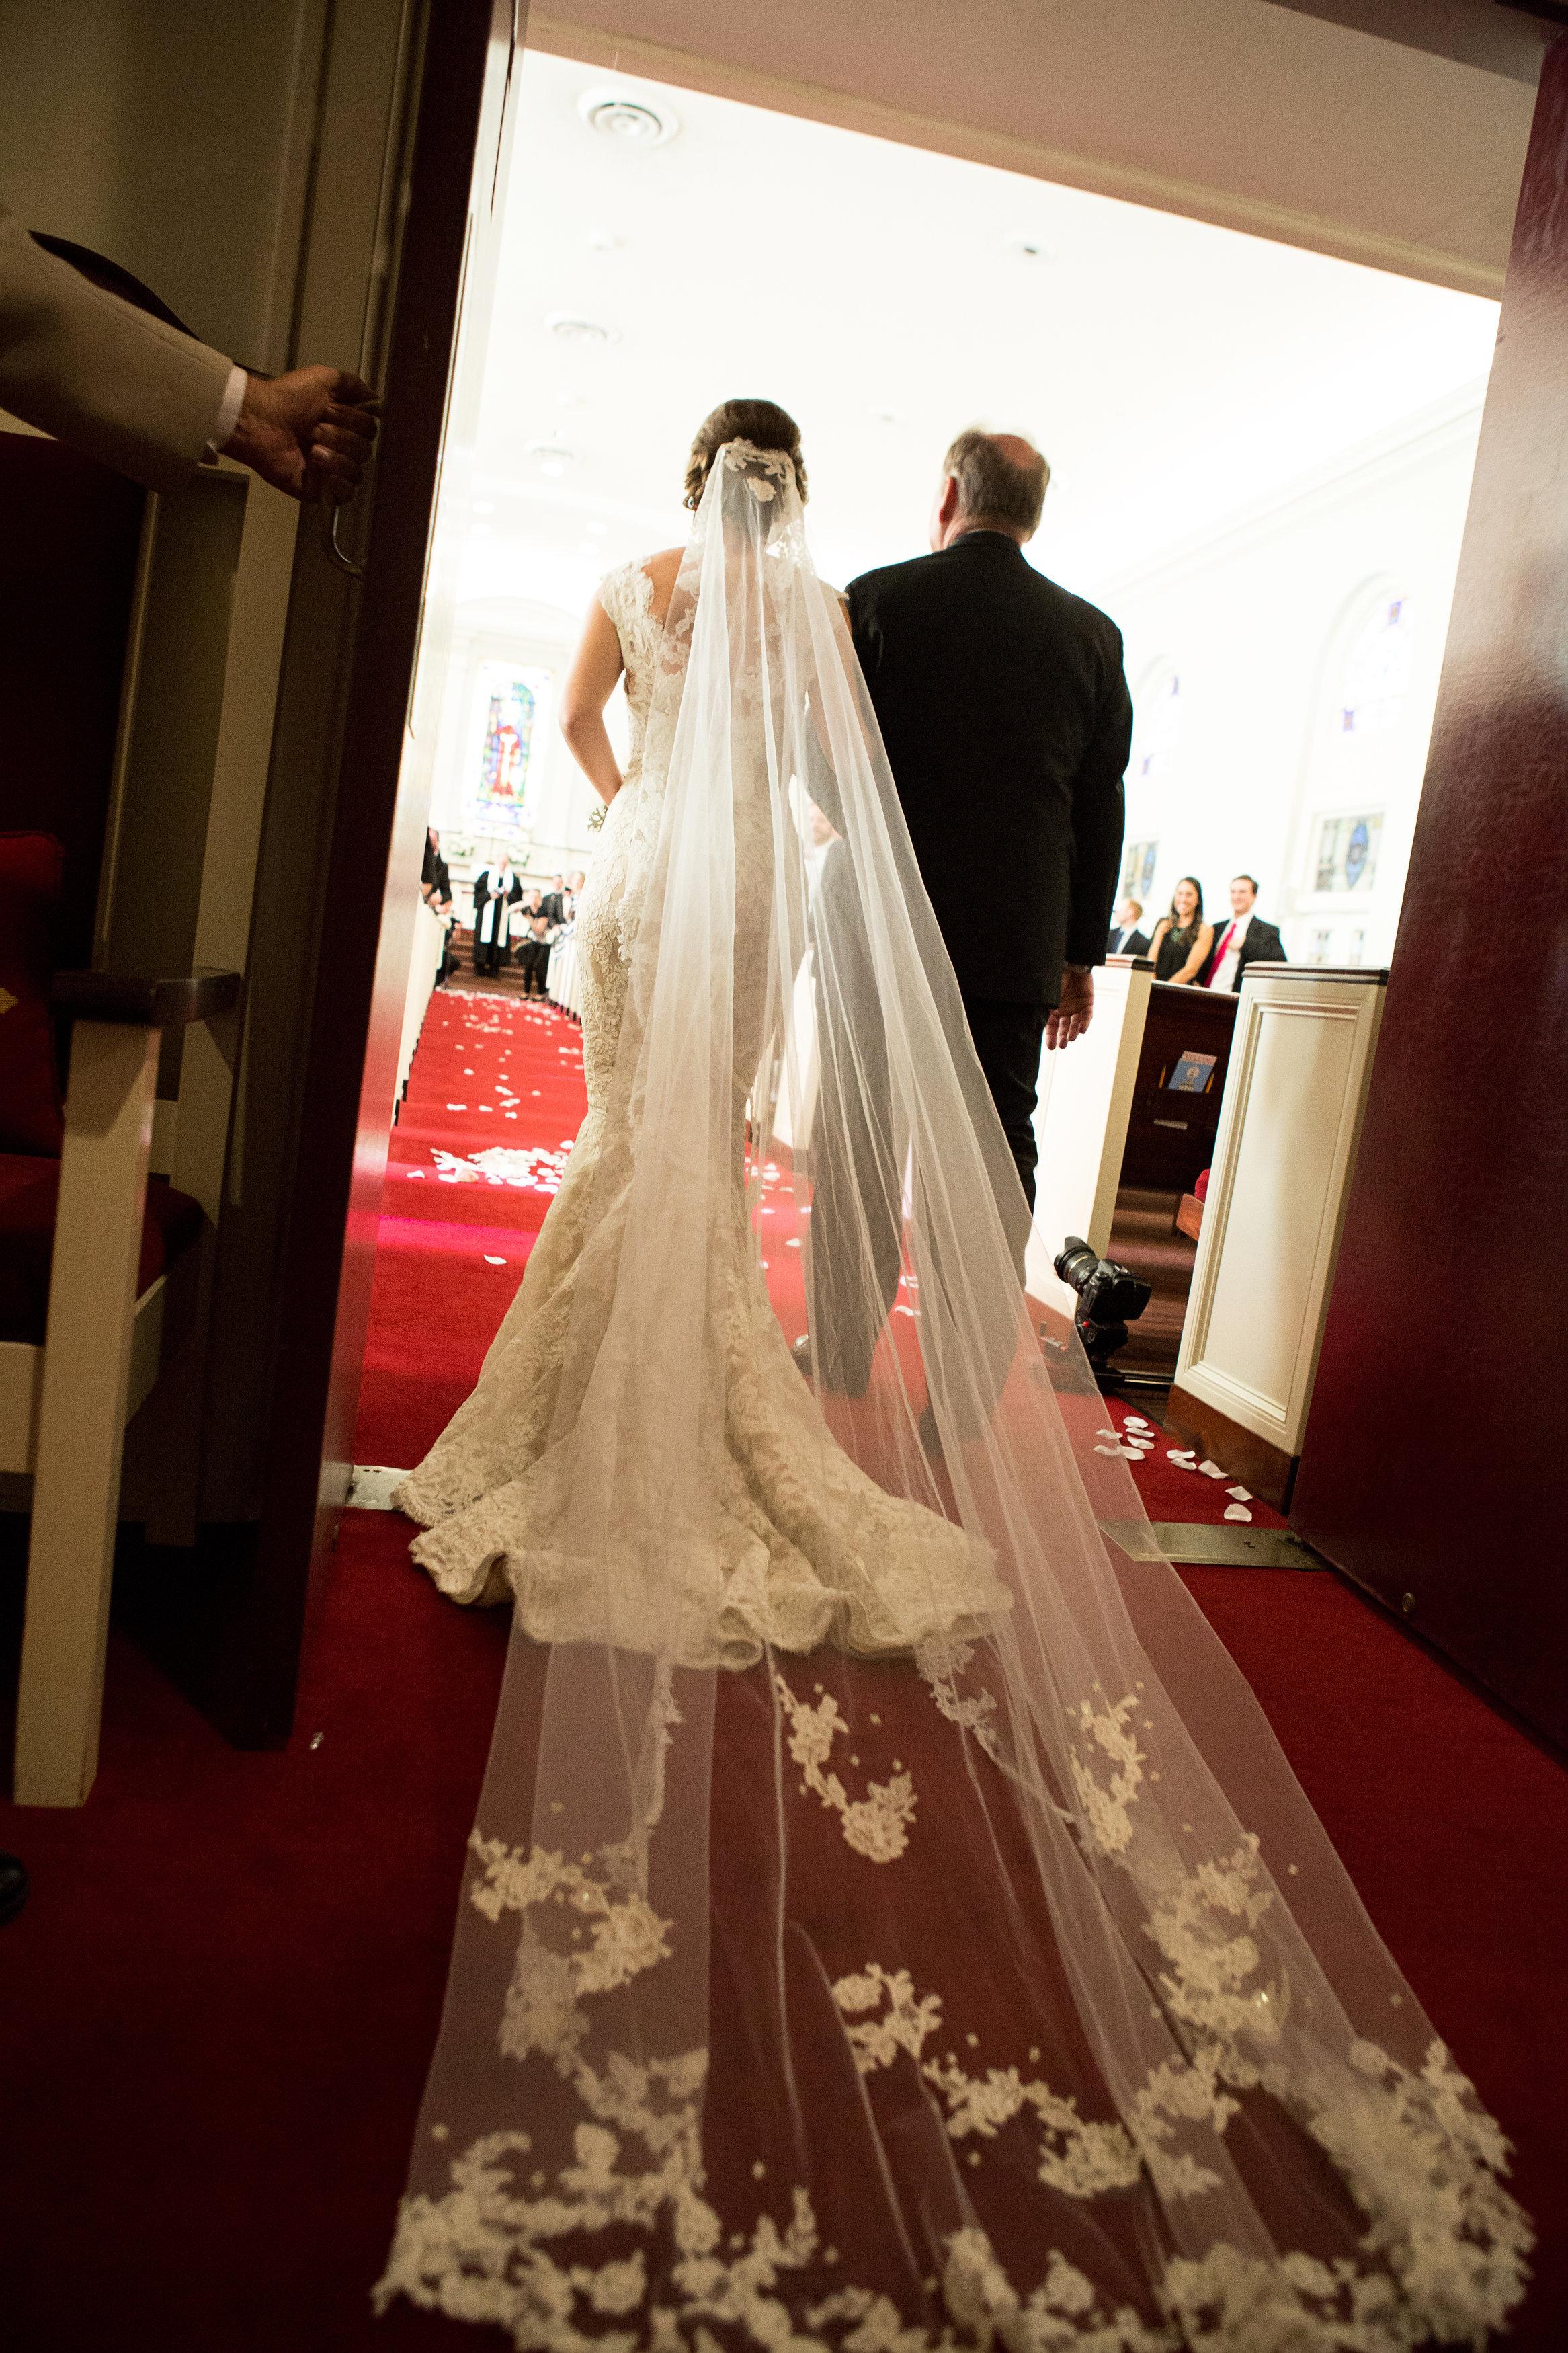 "Cream, White, & Gold ""Old Florida"" Wedding in South Tampa - Tampa Yacht Club Wedding - Tampa Wedding Photographer Blue Lane Studios (29)"